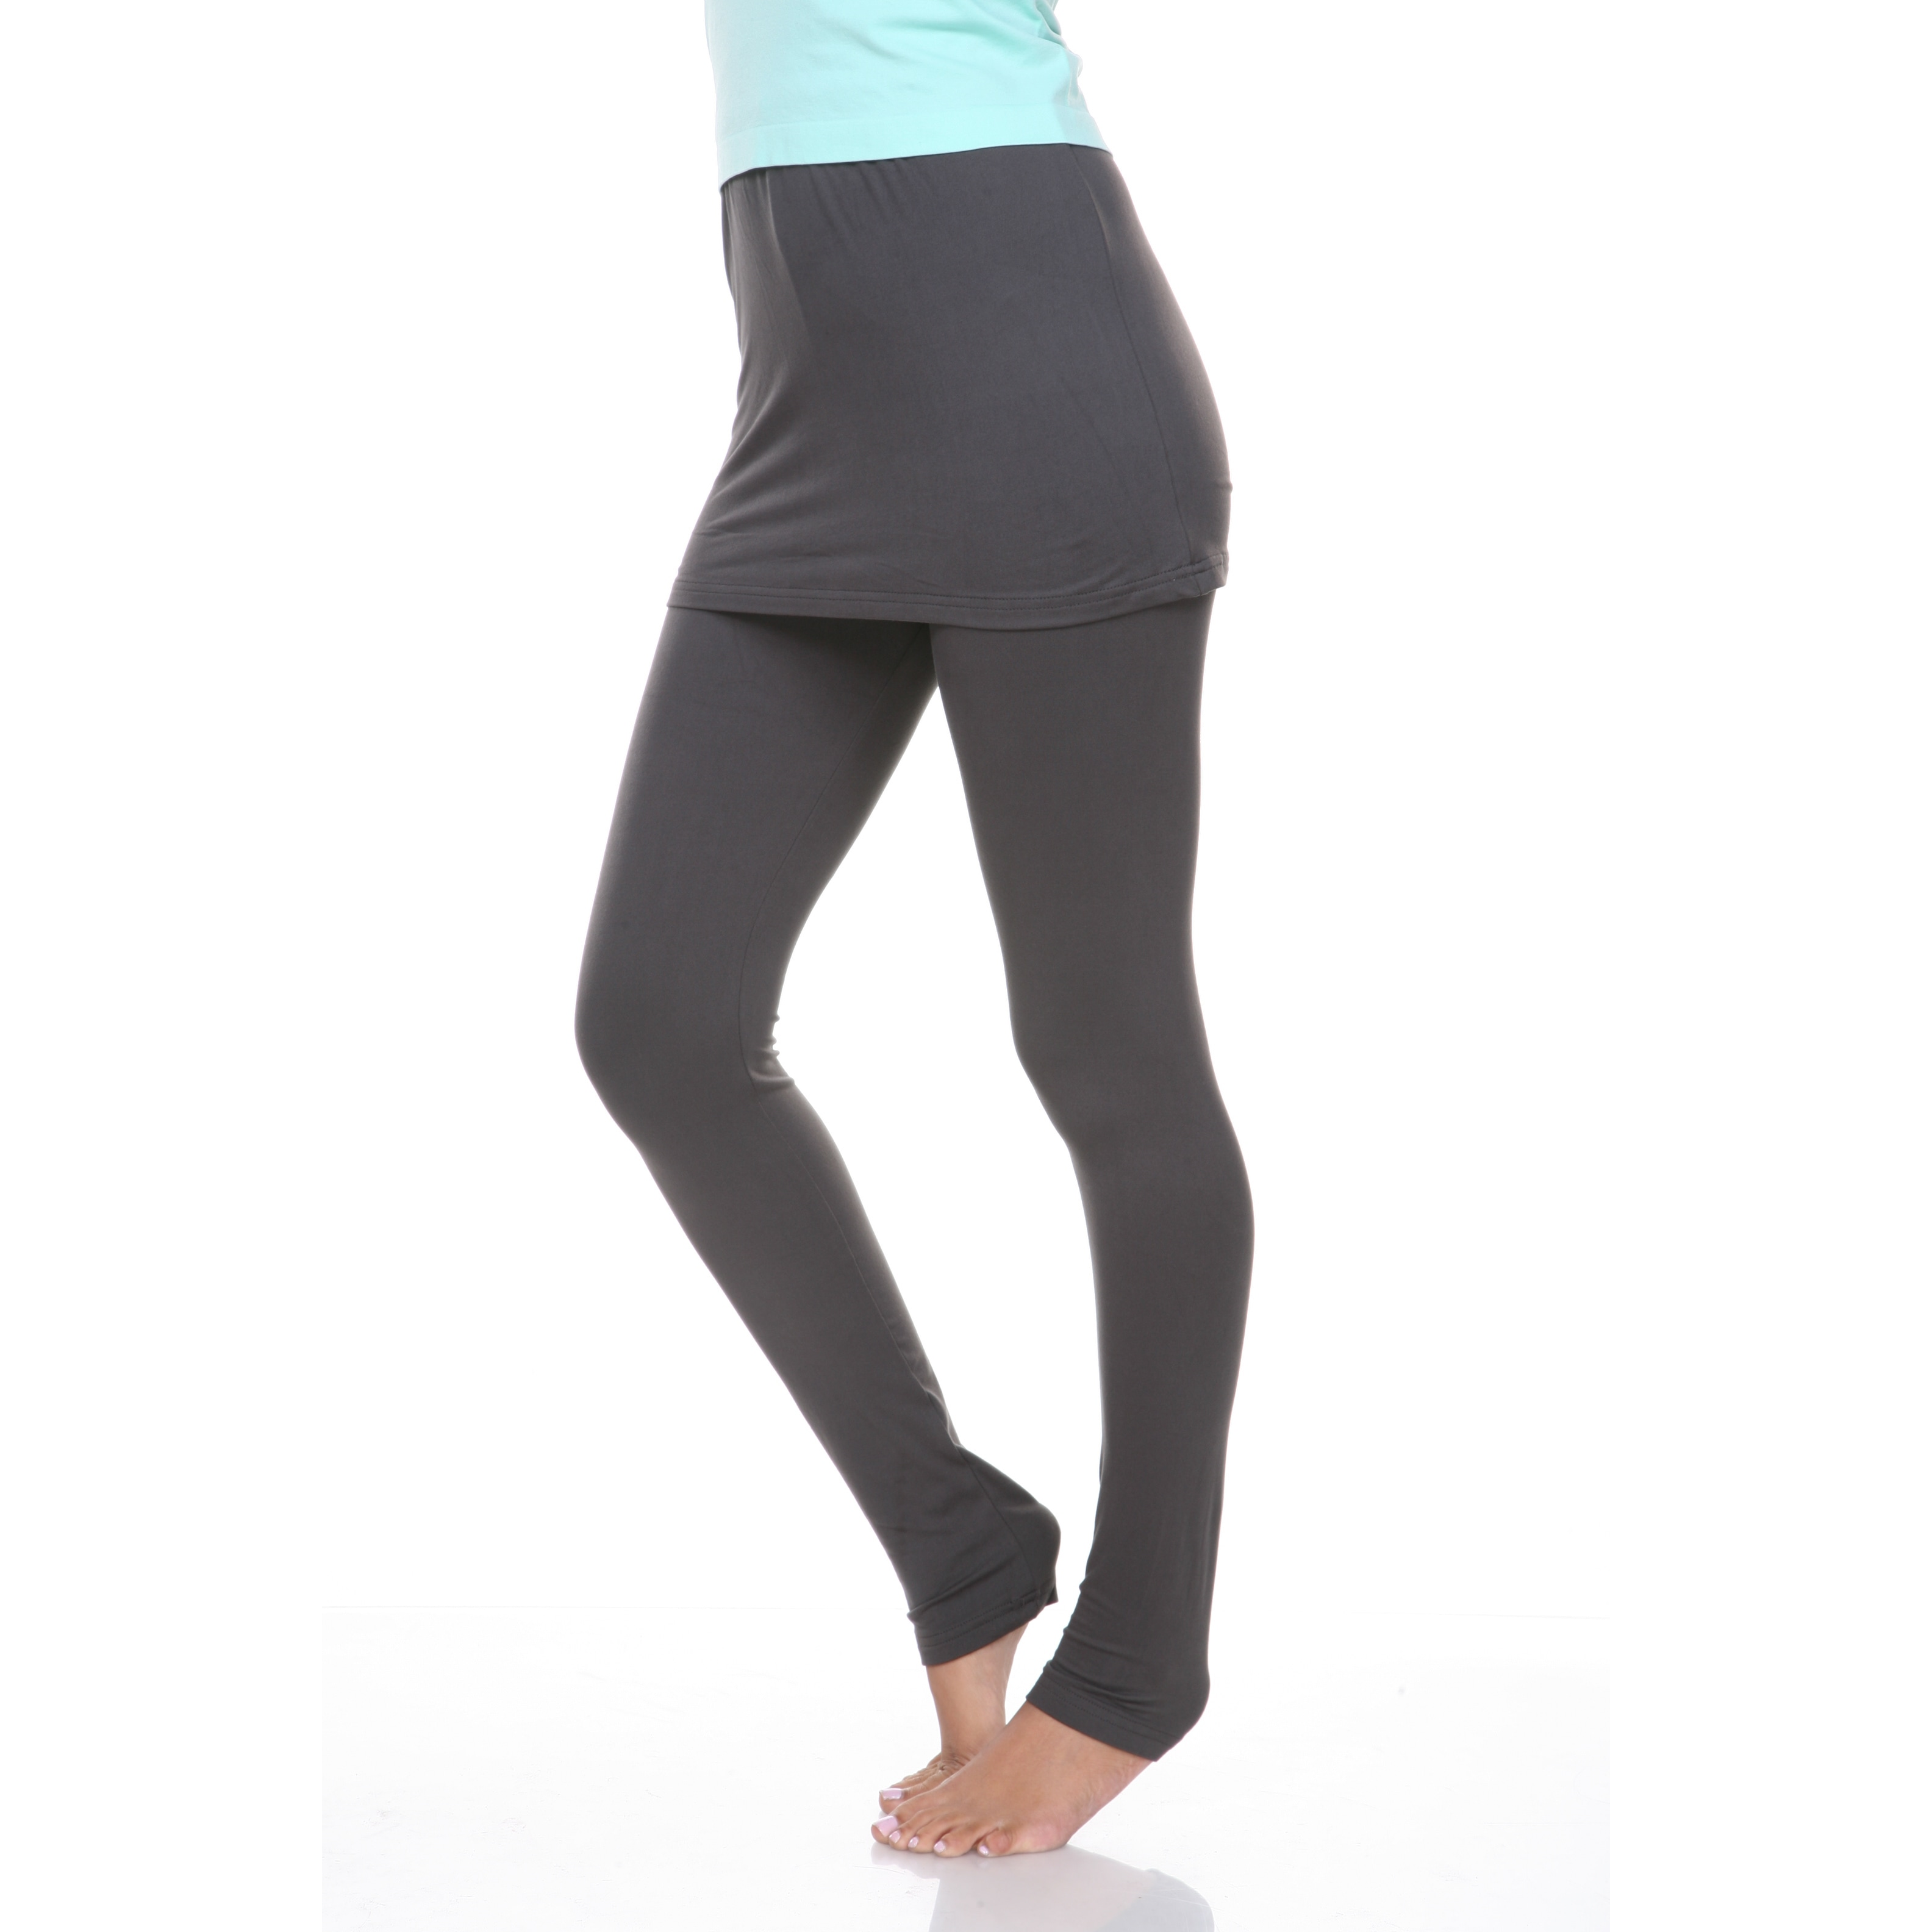 421a1b9626 Shop White Mark Women's Skirted Leggings - On Sale - Free Shipping On  Orders Over $45 - Overstock - 9602763